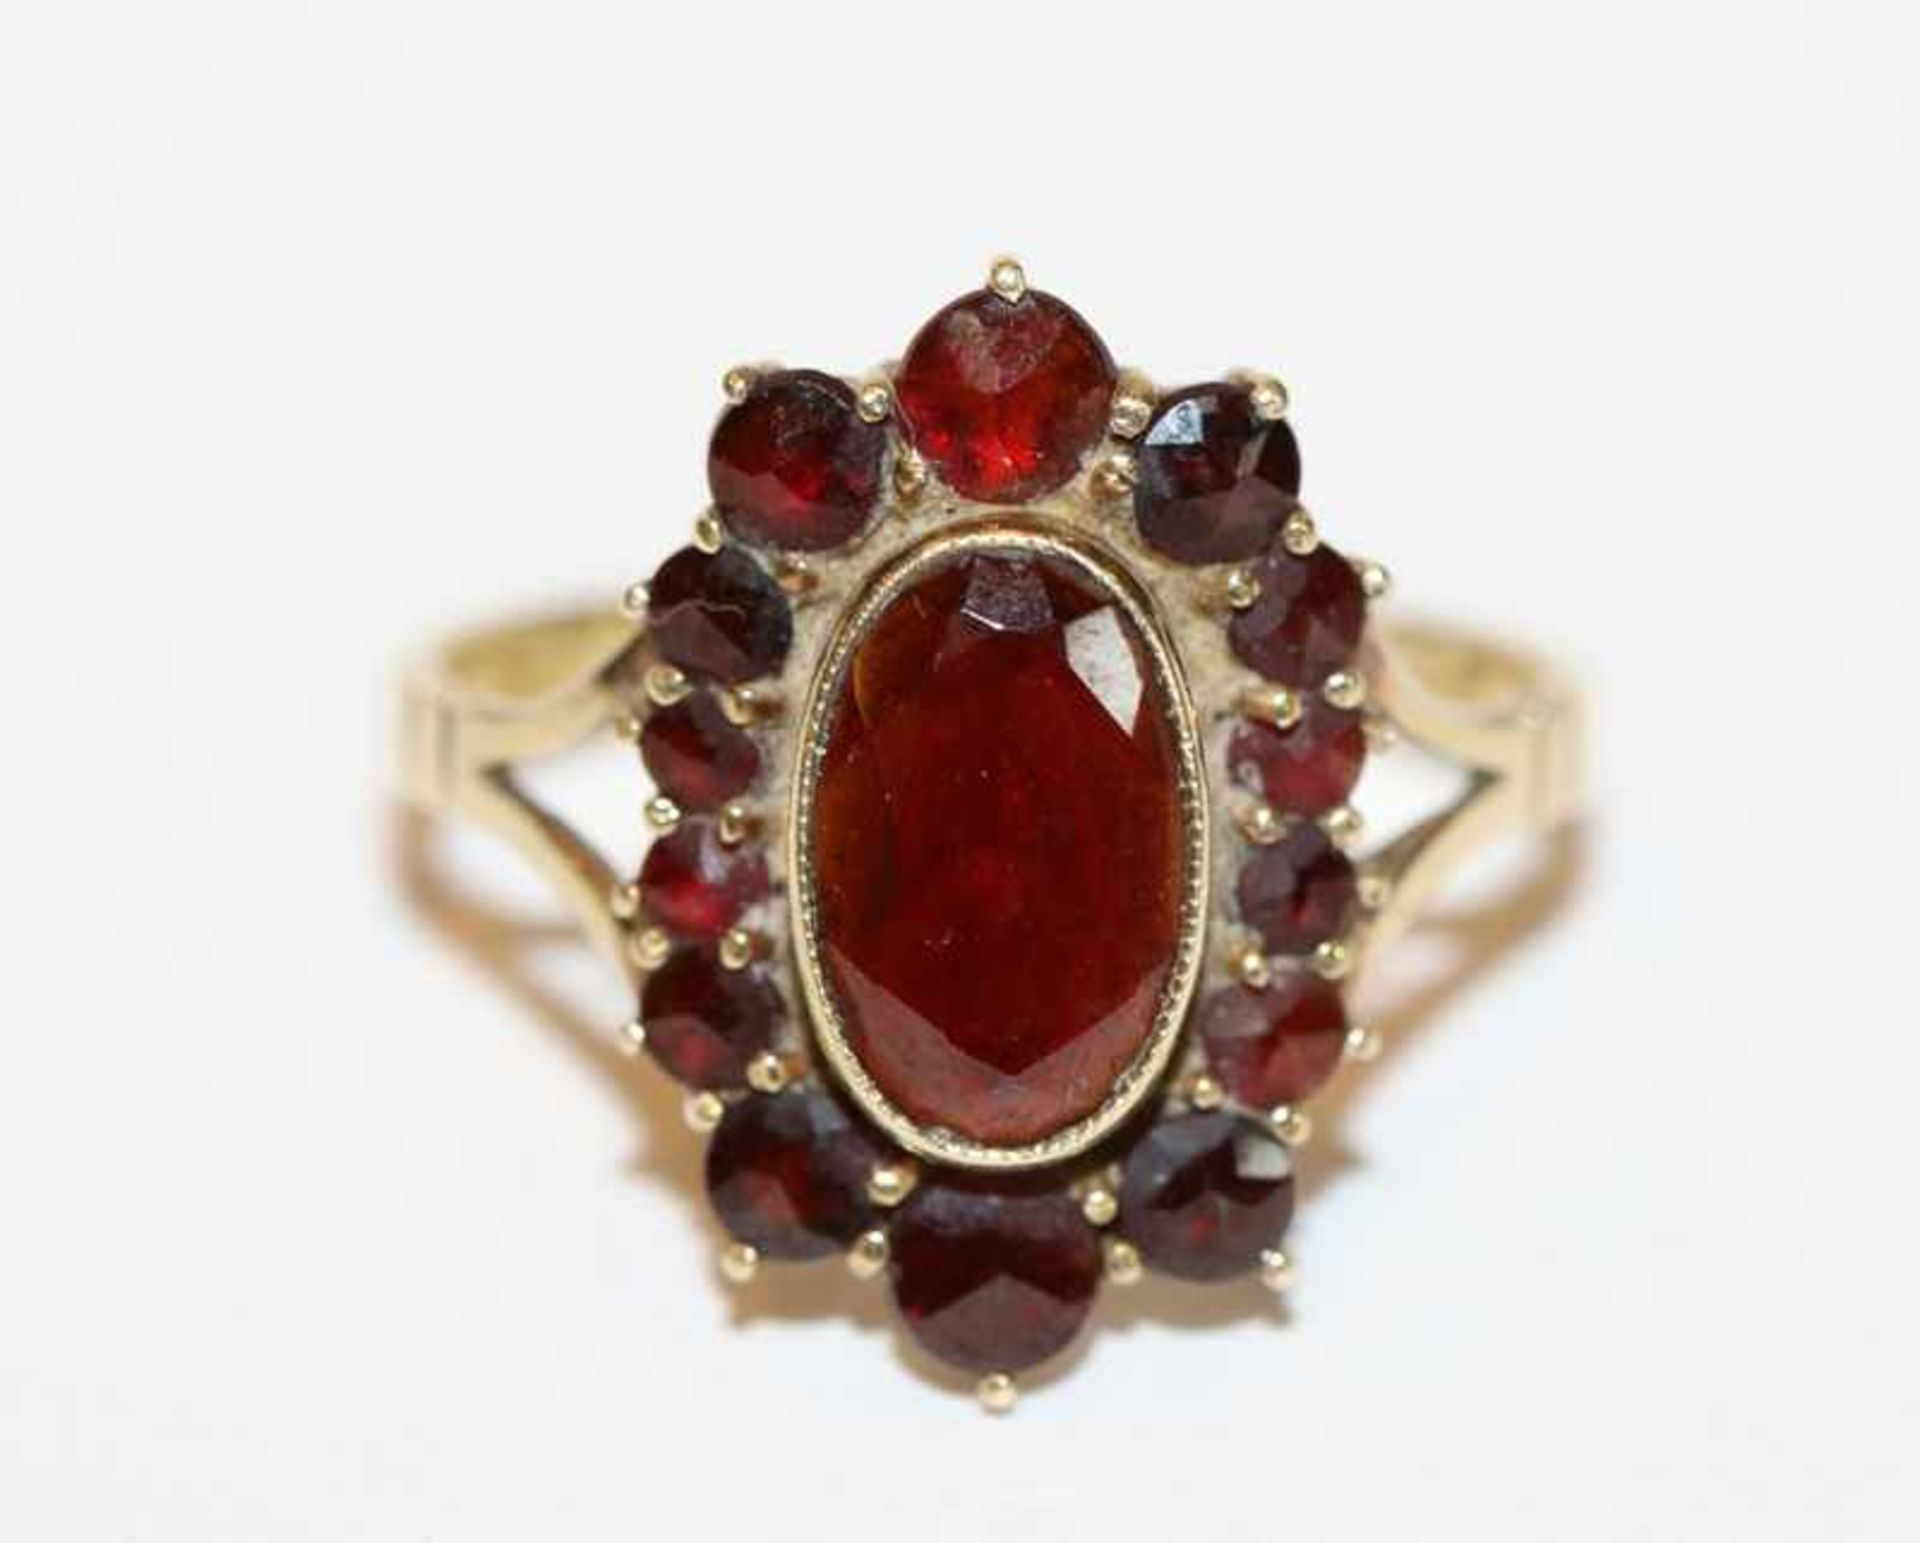 Los 89 - 8 k Gelbgold Ring mit Granaten, Gr. 57